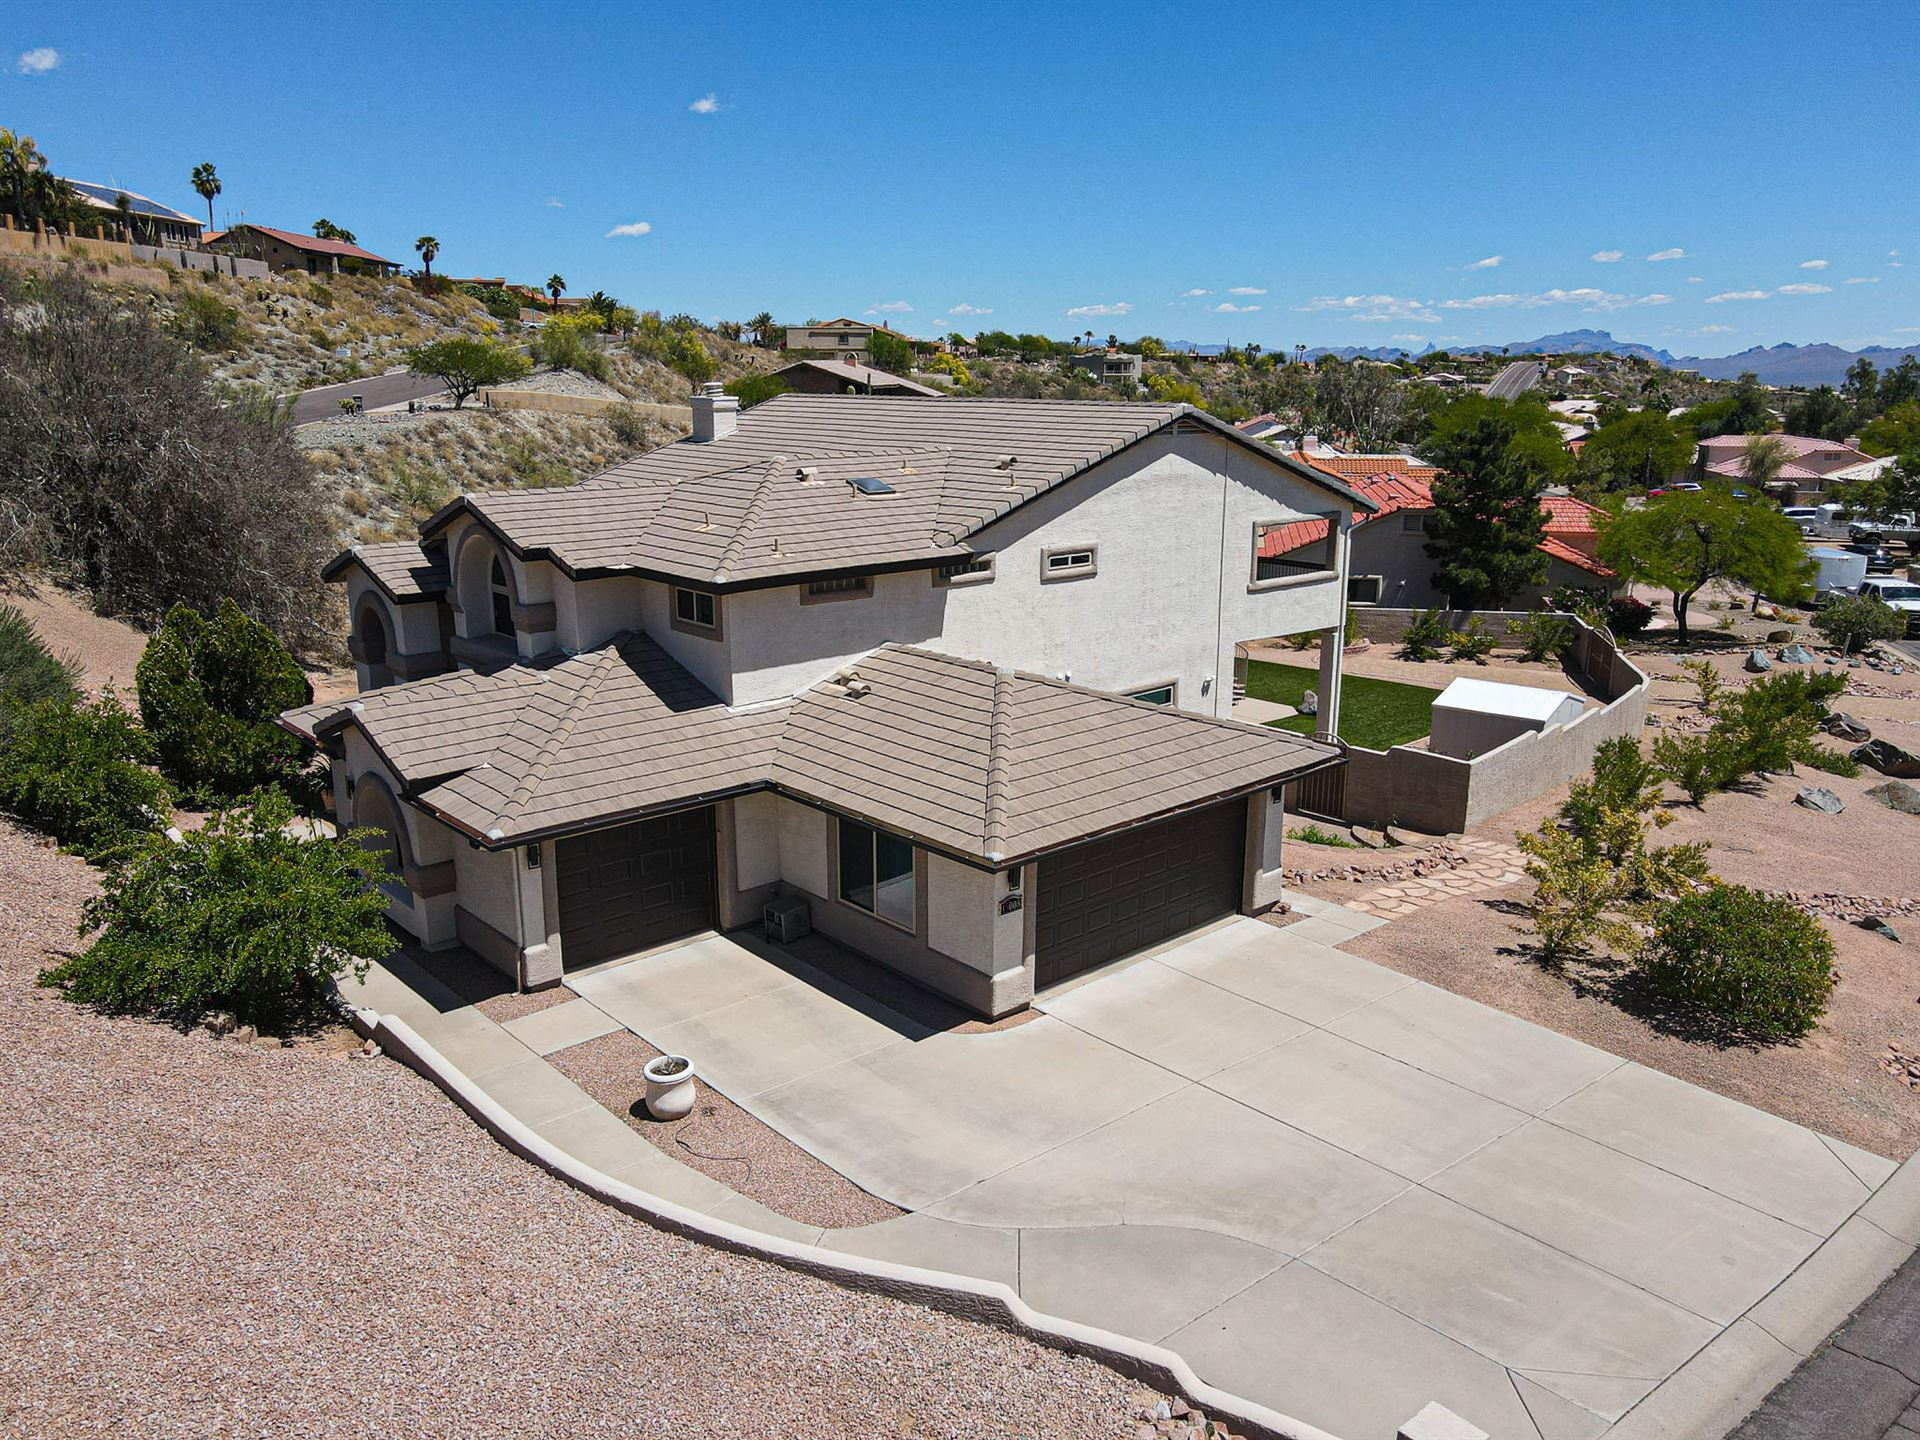 Photo of 15008 E GREENE VALLEY Drive, Fountain Hills, AZ 85268 (MLS # 6230230)